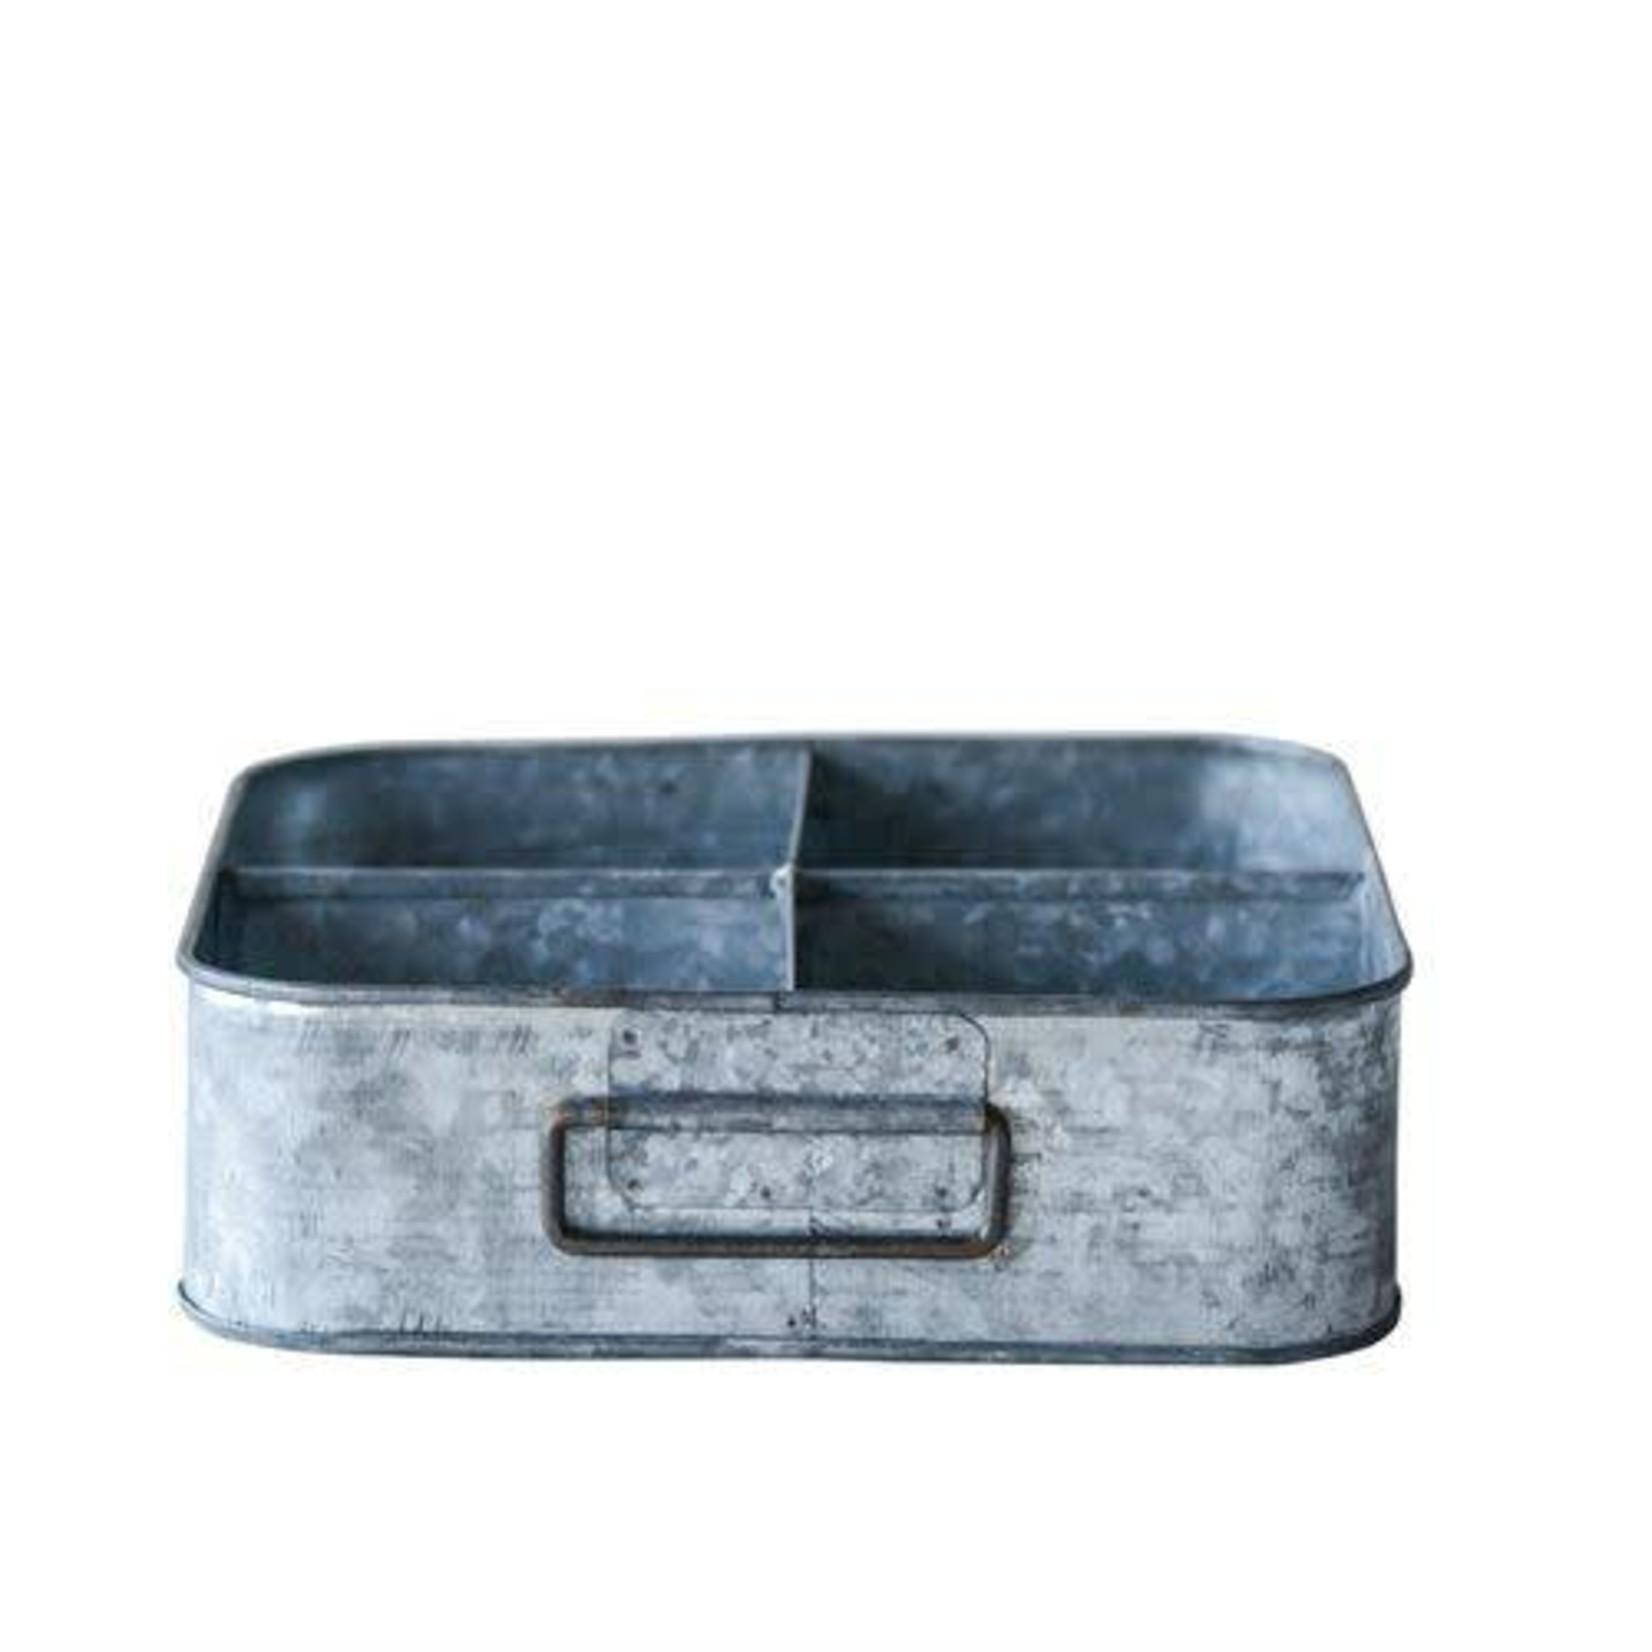 Galvanized Metal Container w/ Handles XM1967